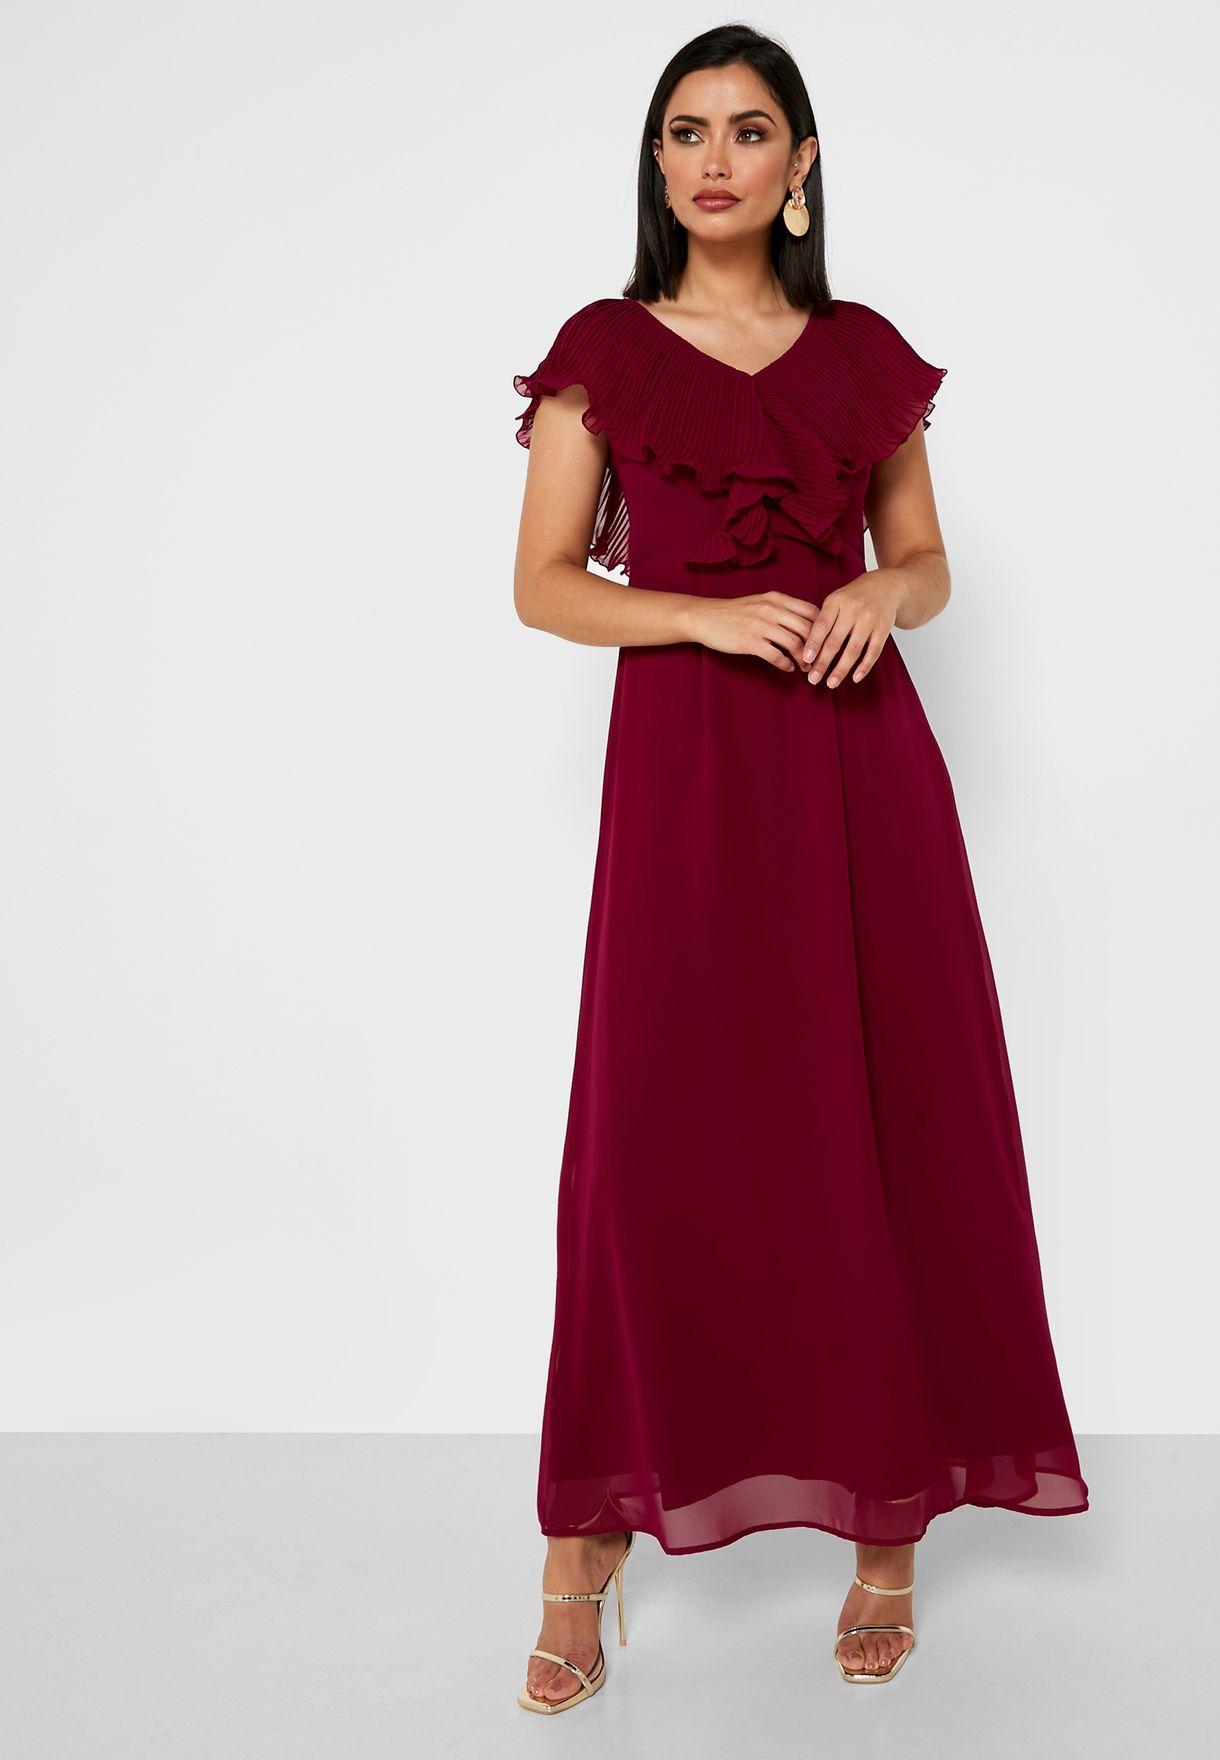 فستان بكشكش